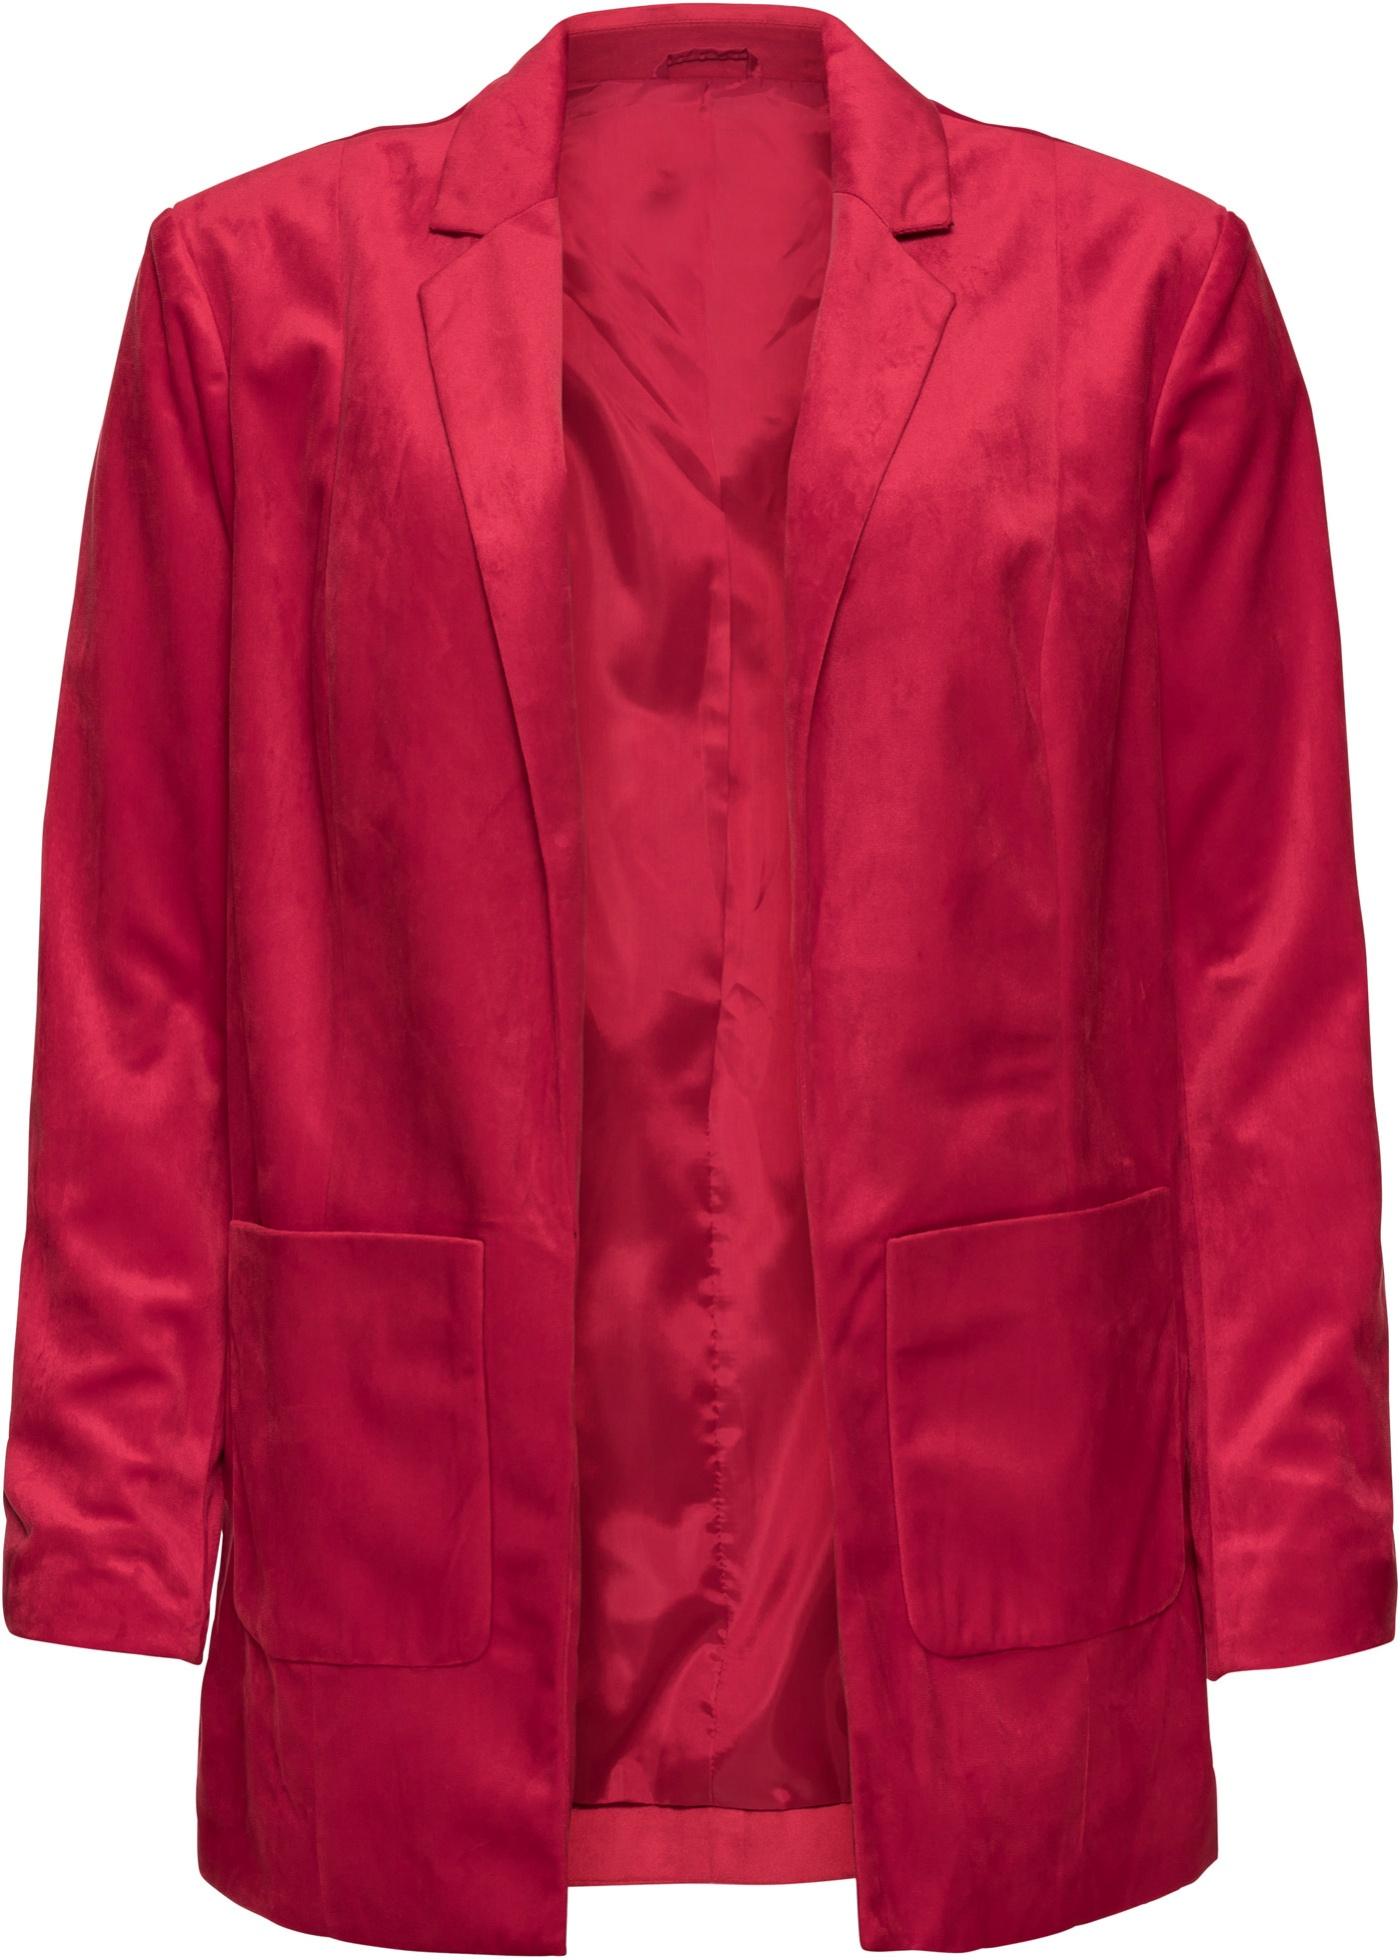 Blazer in velluto (Rosso) - RAINBOW